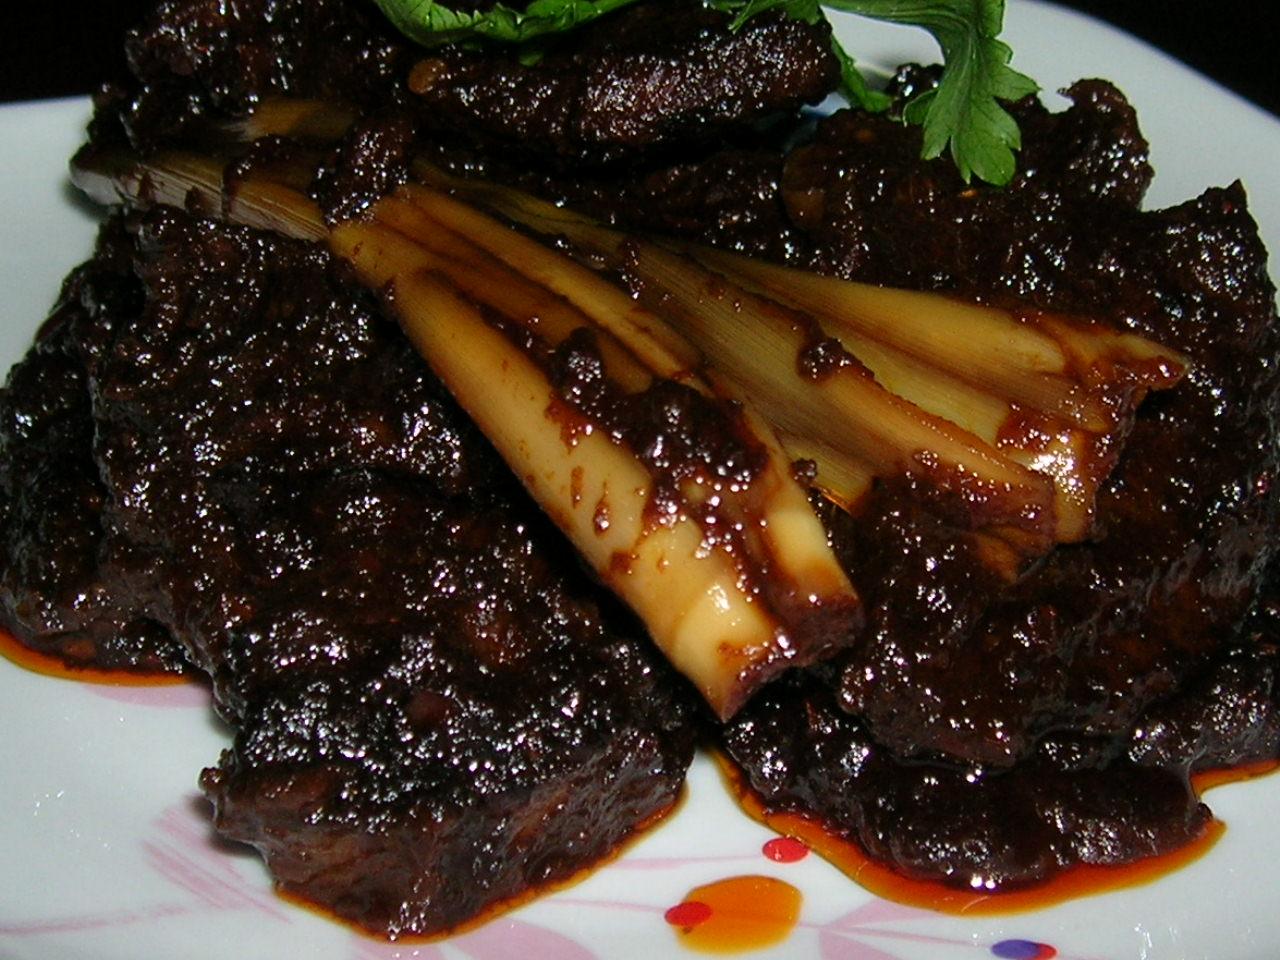 Chef Obie Kelas Masakan 1001 Info & Resepi: Resepi Masakan ...